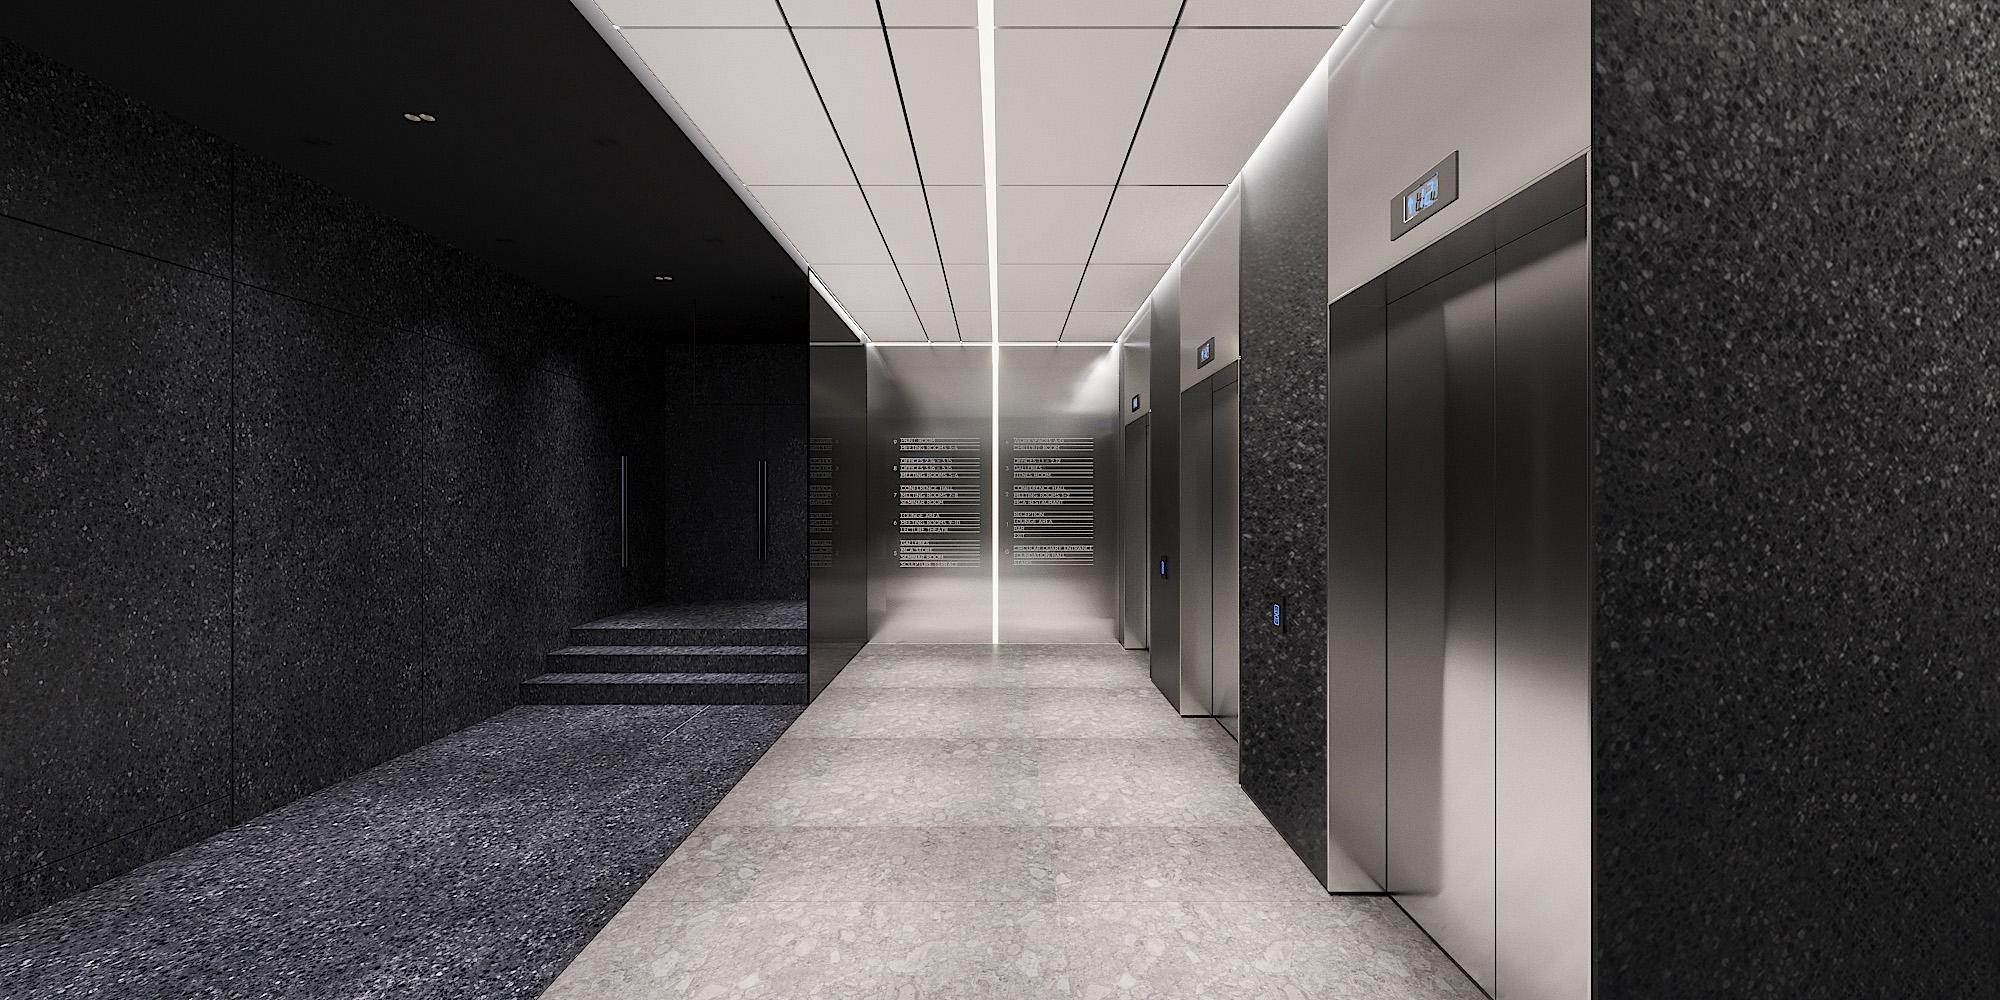 PSHKN Business Space 1912 Lipinskogo lift hall